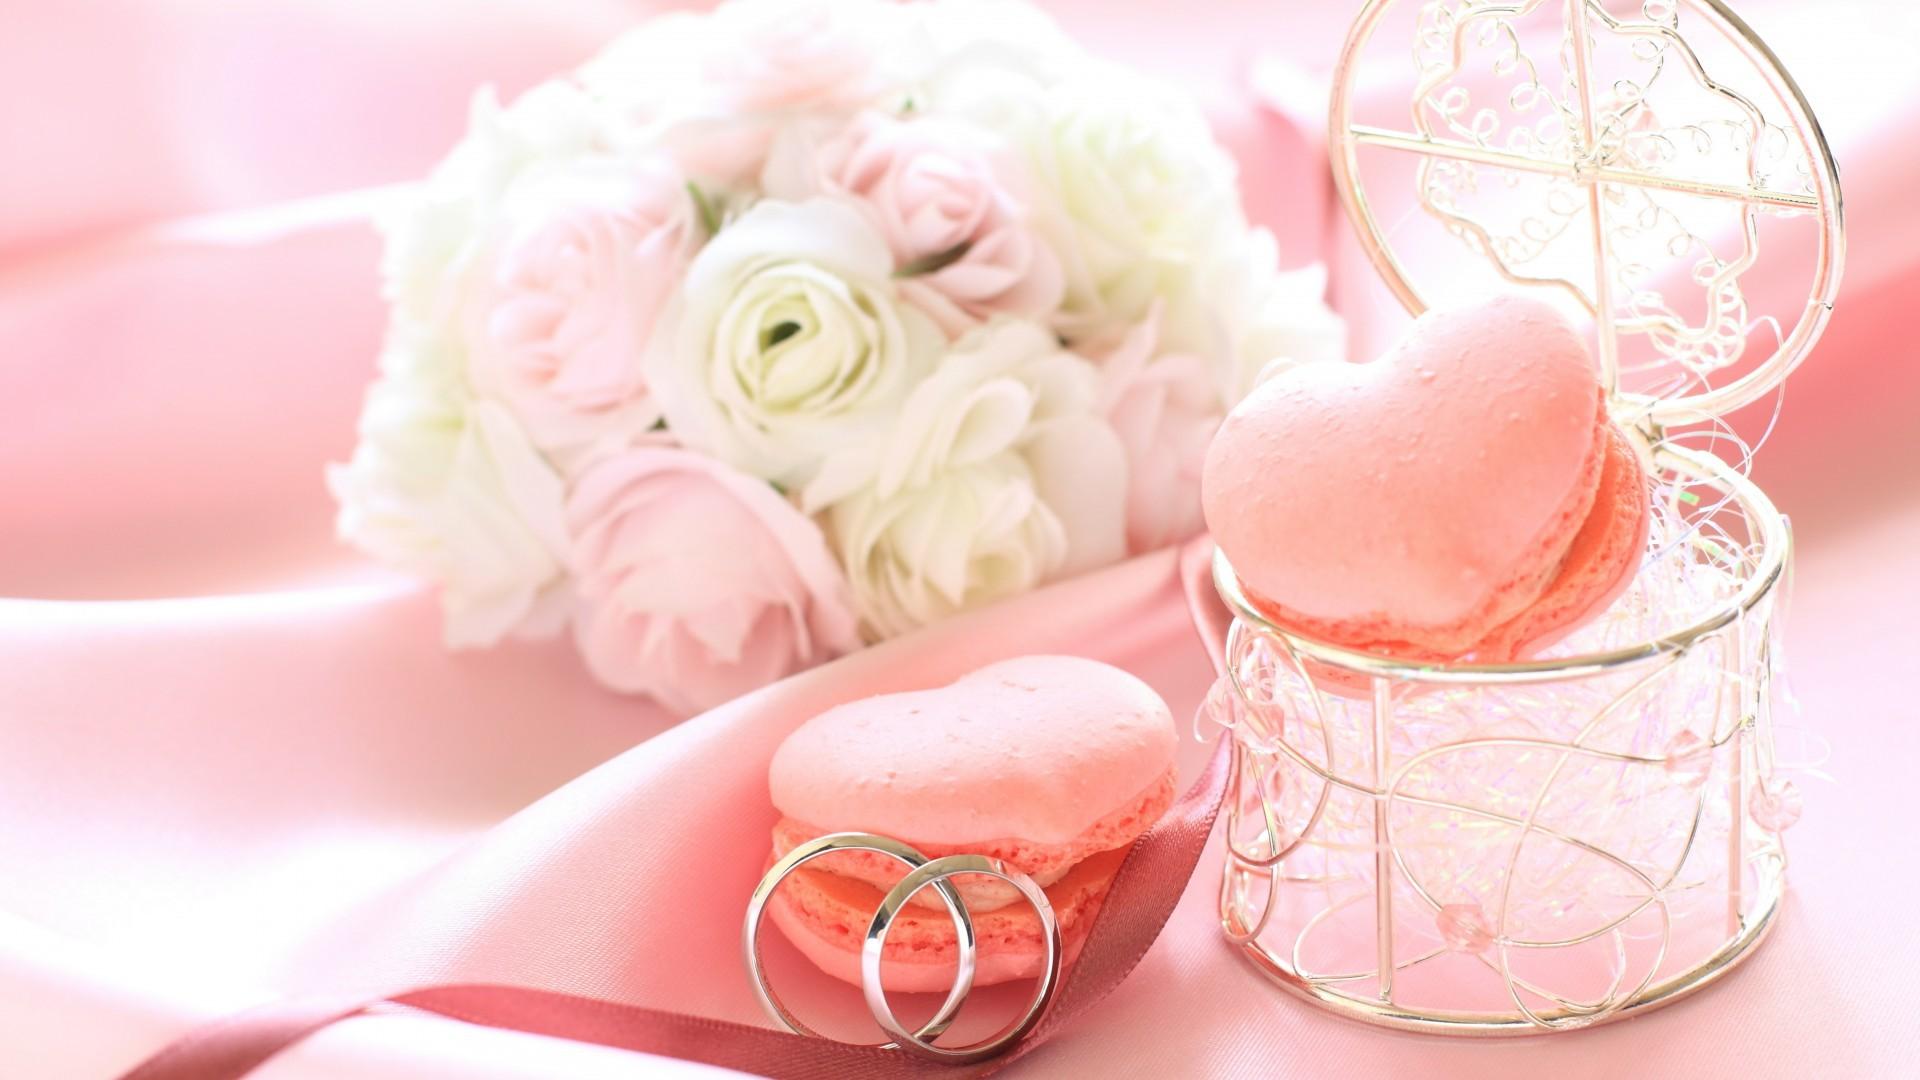 Download wallpaper 1366x768 pie, sweet, wedding, ornament, circles.